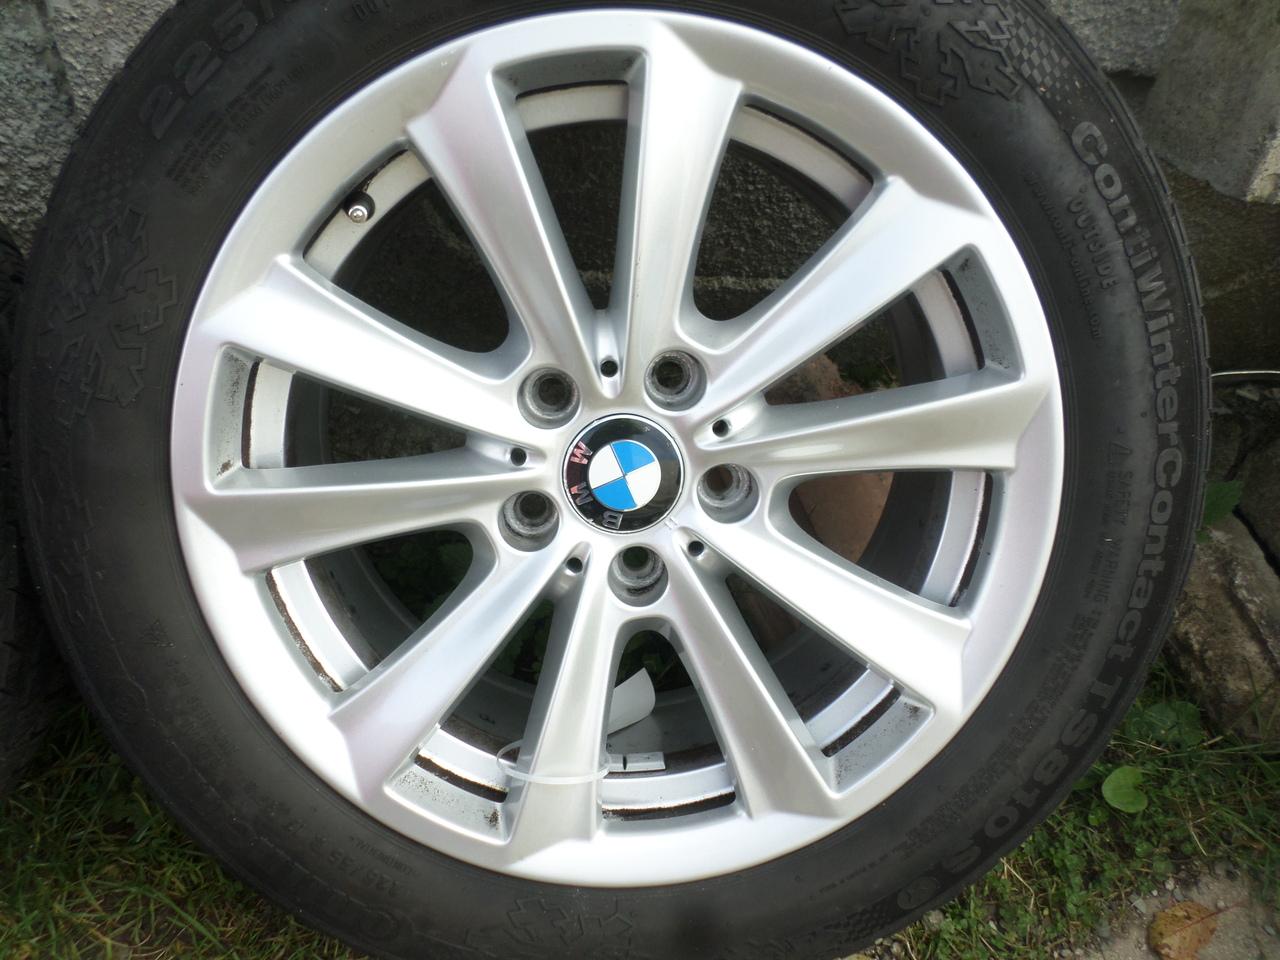 Jante BMW seria 5 f10 cu anvelope de iarna 225 55 17 Continental